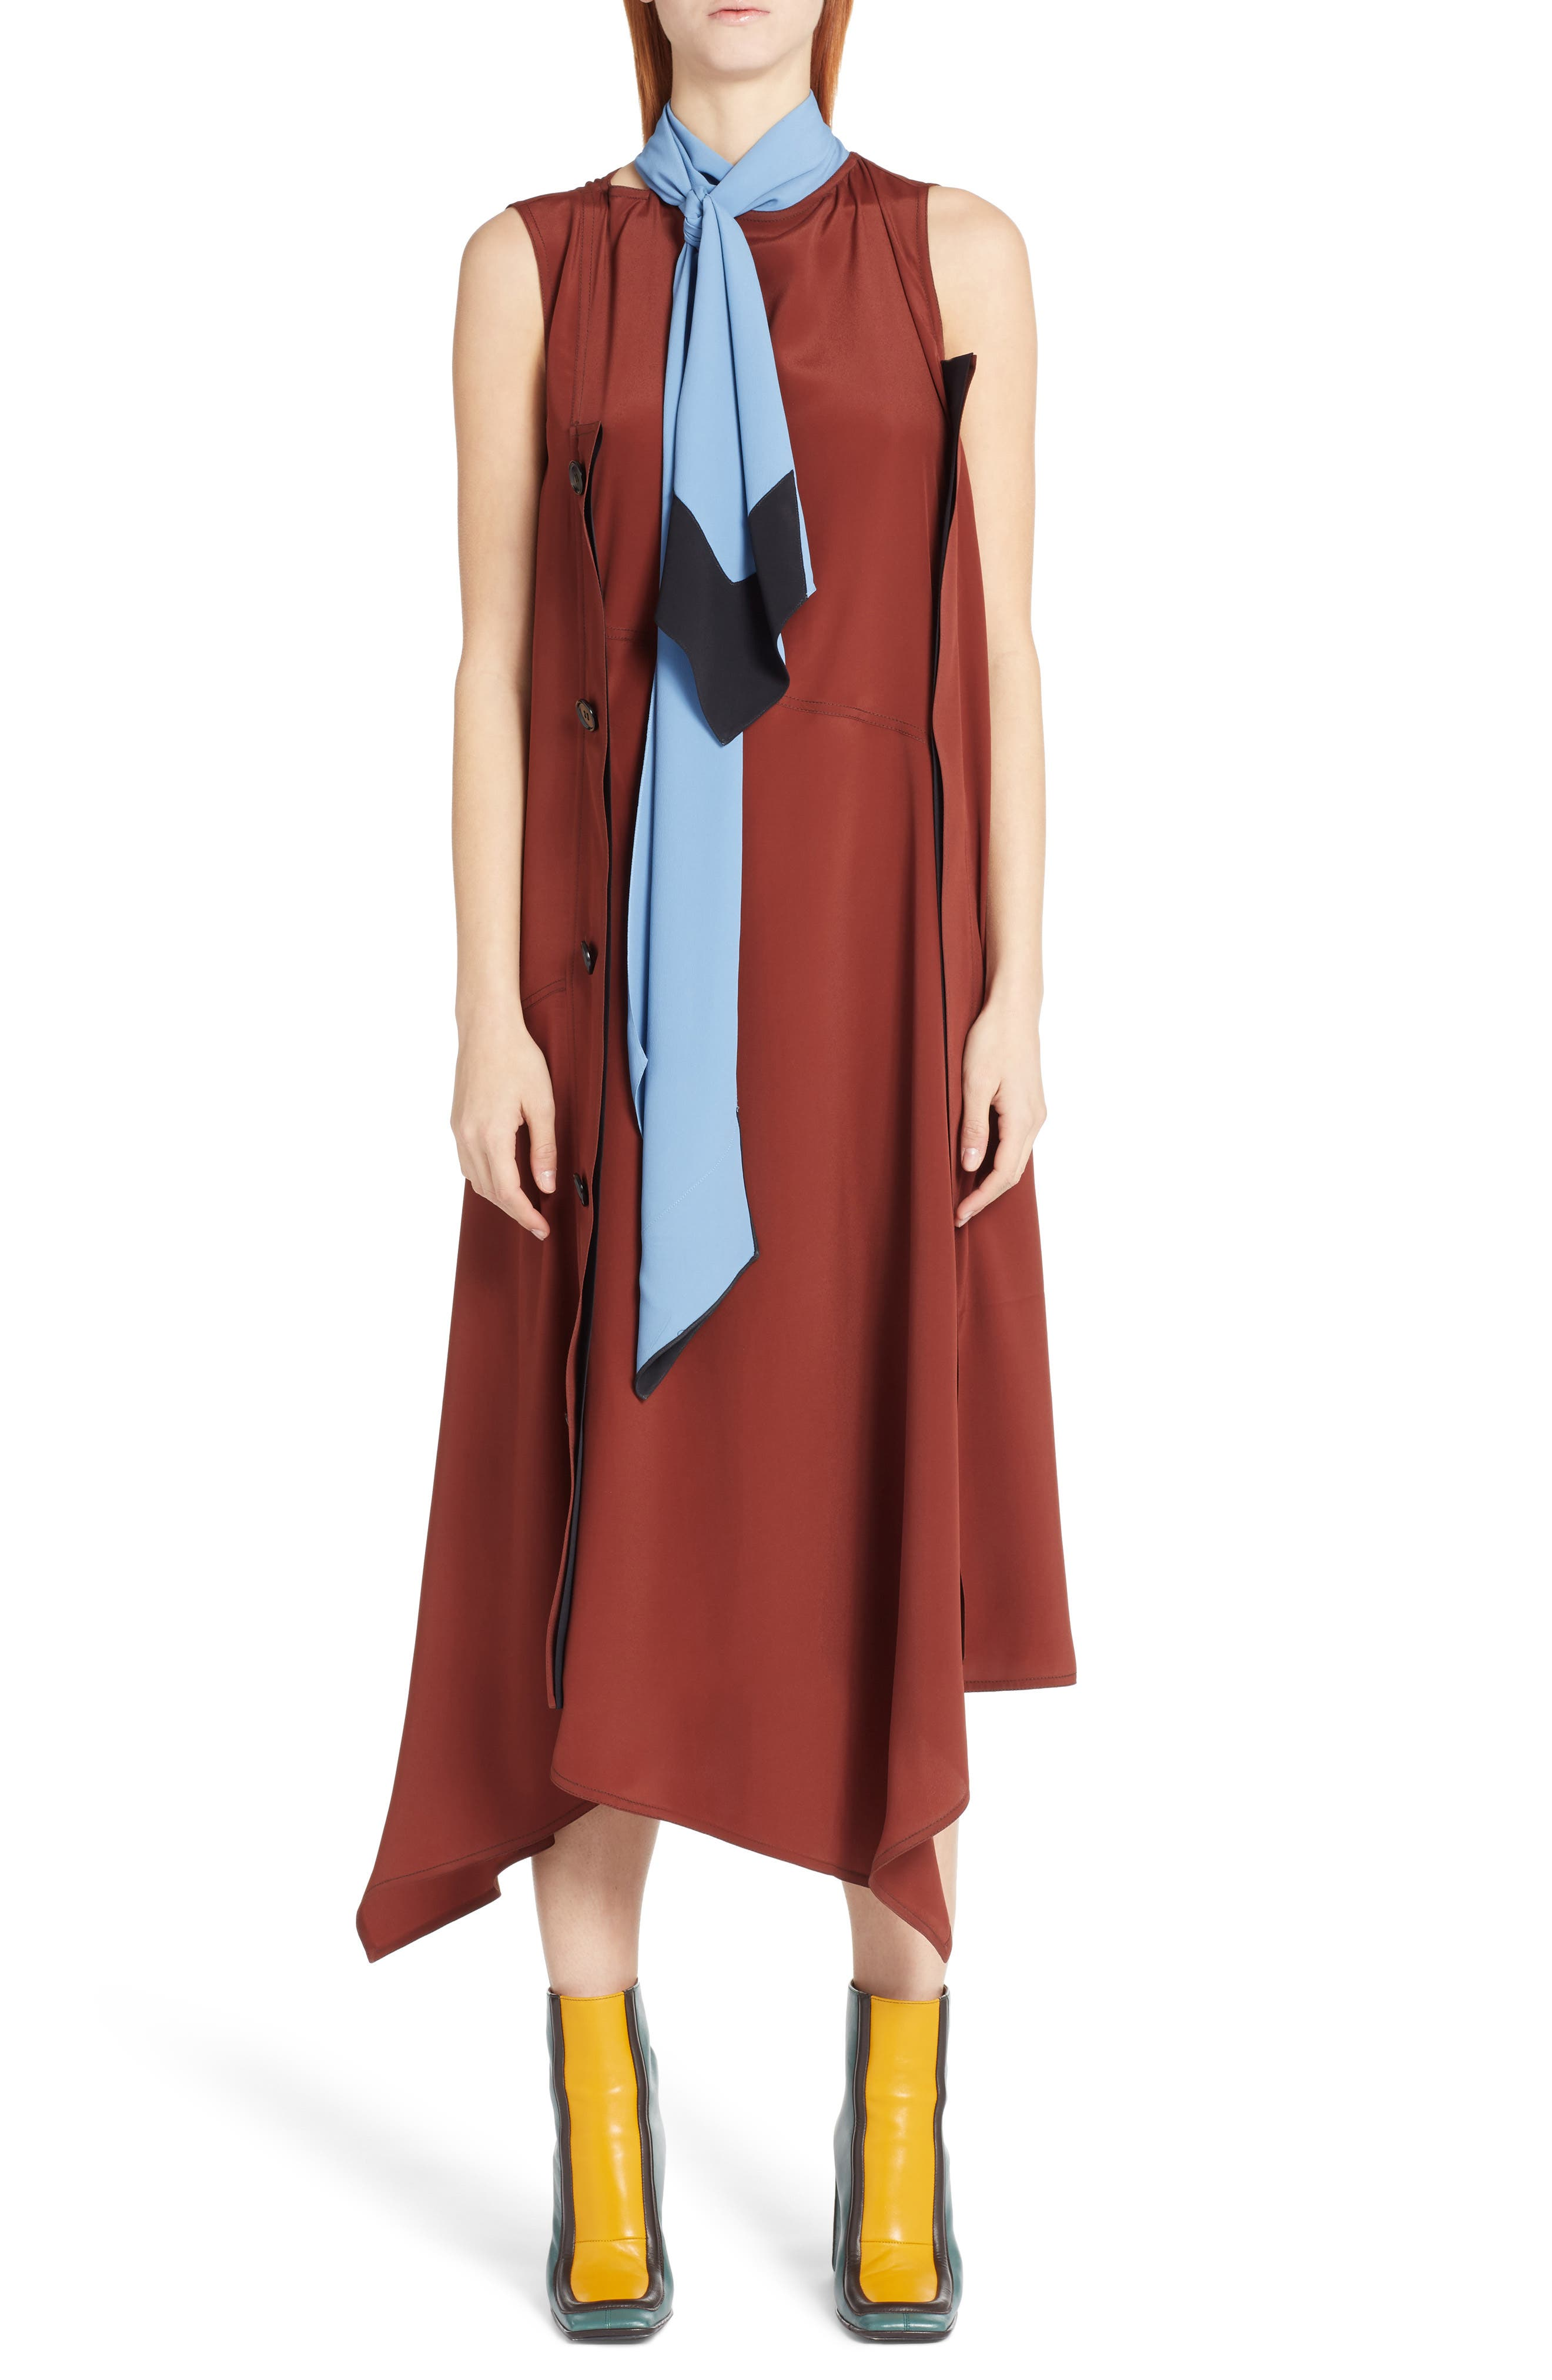 Marni Tie Neck Side Button Dress